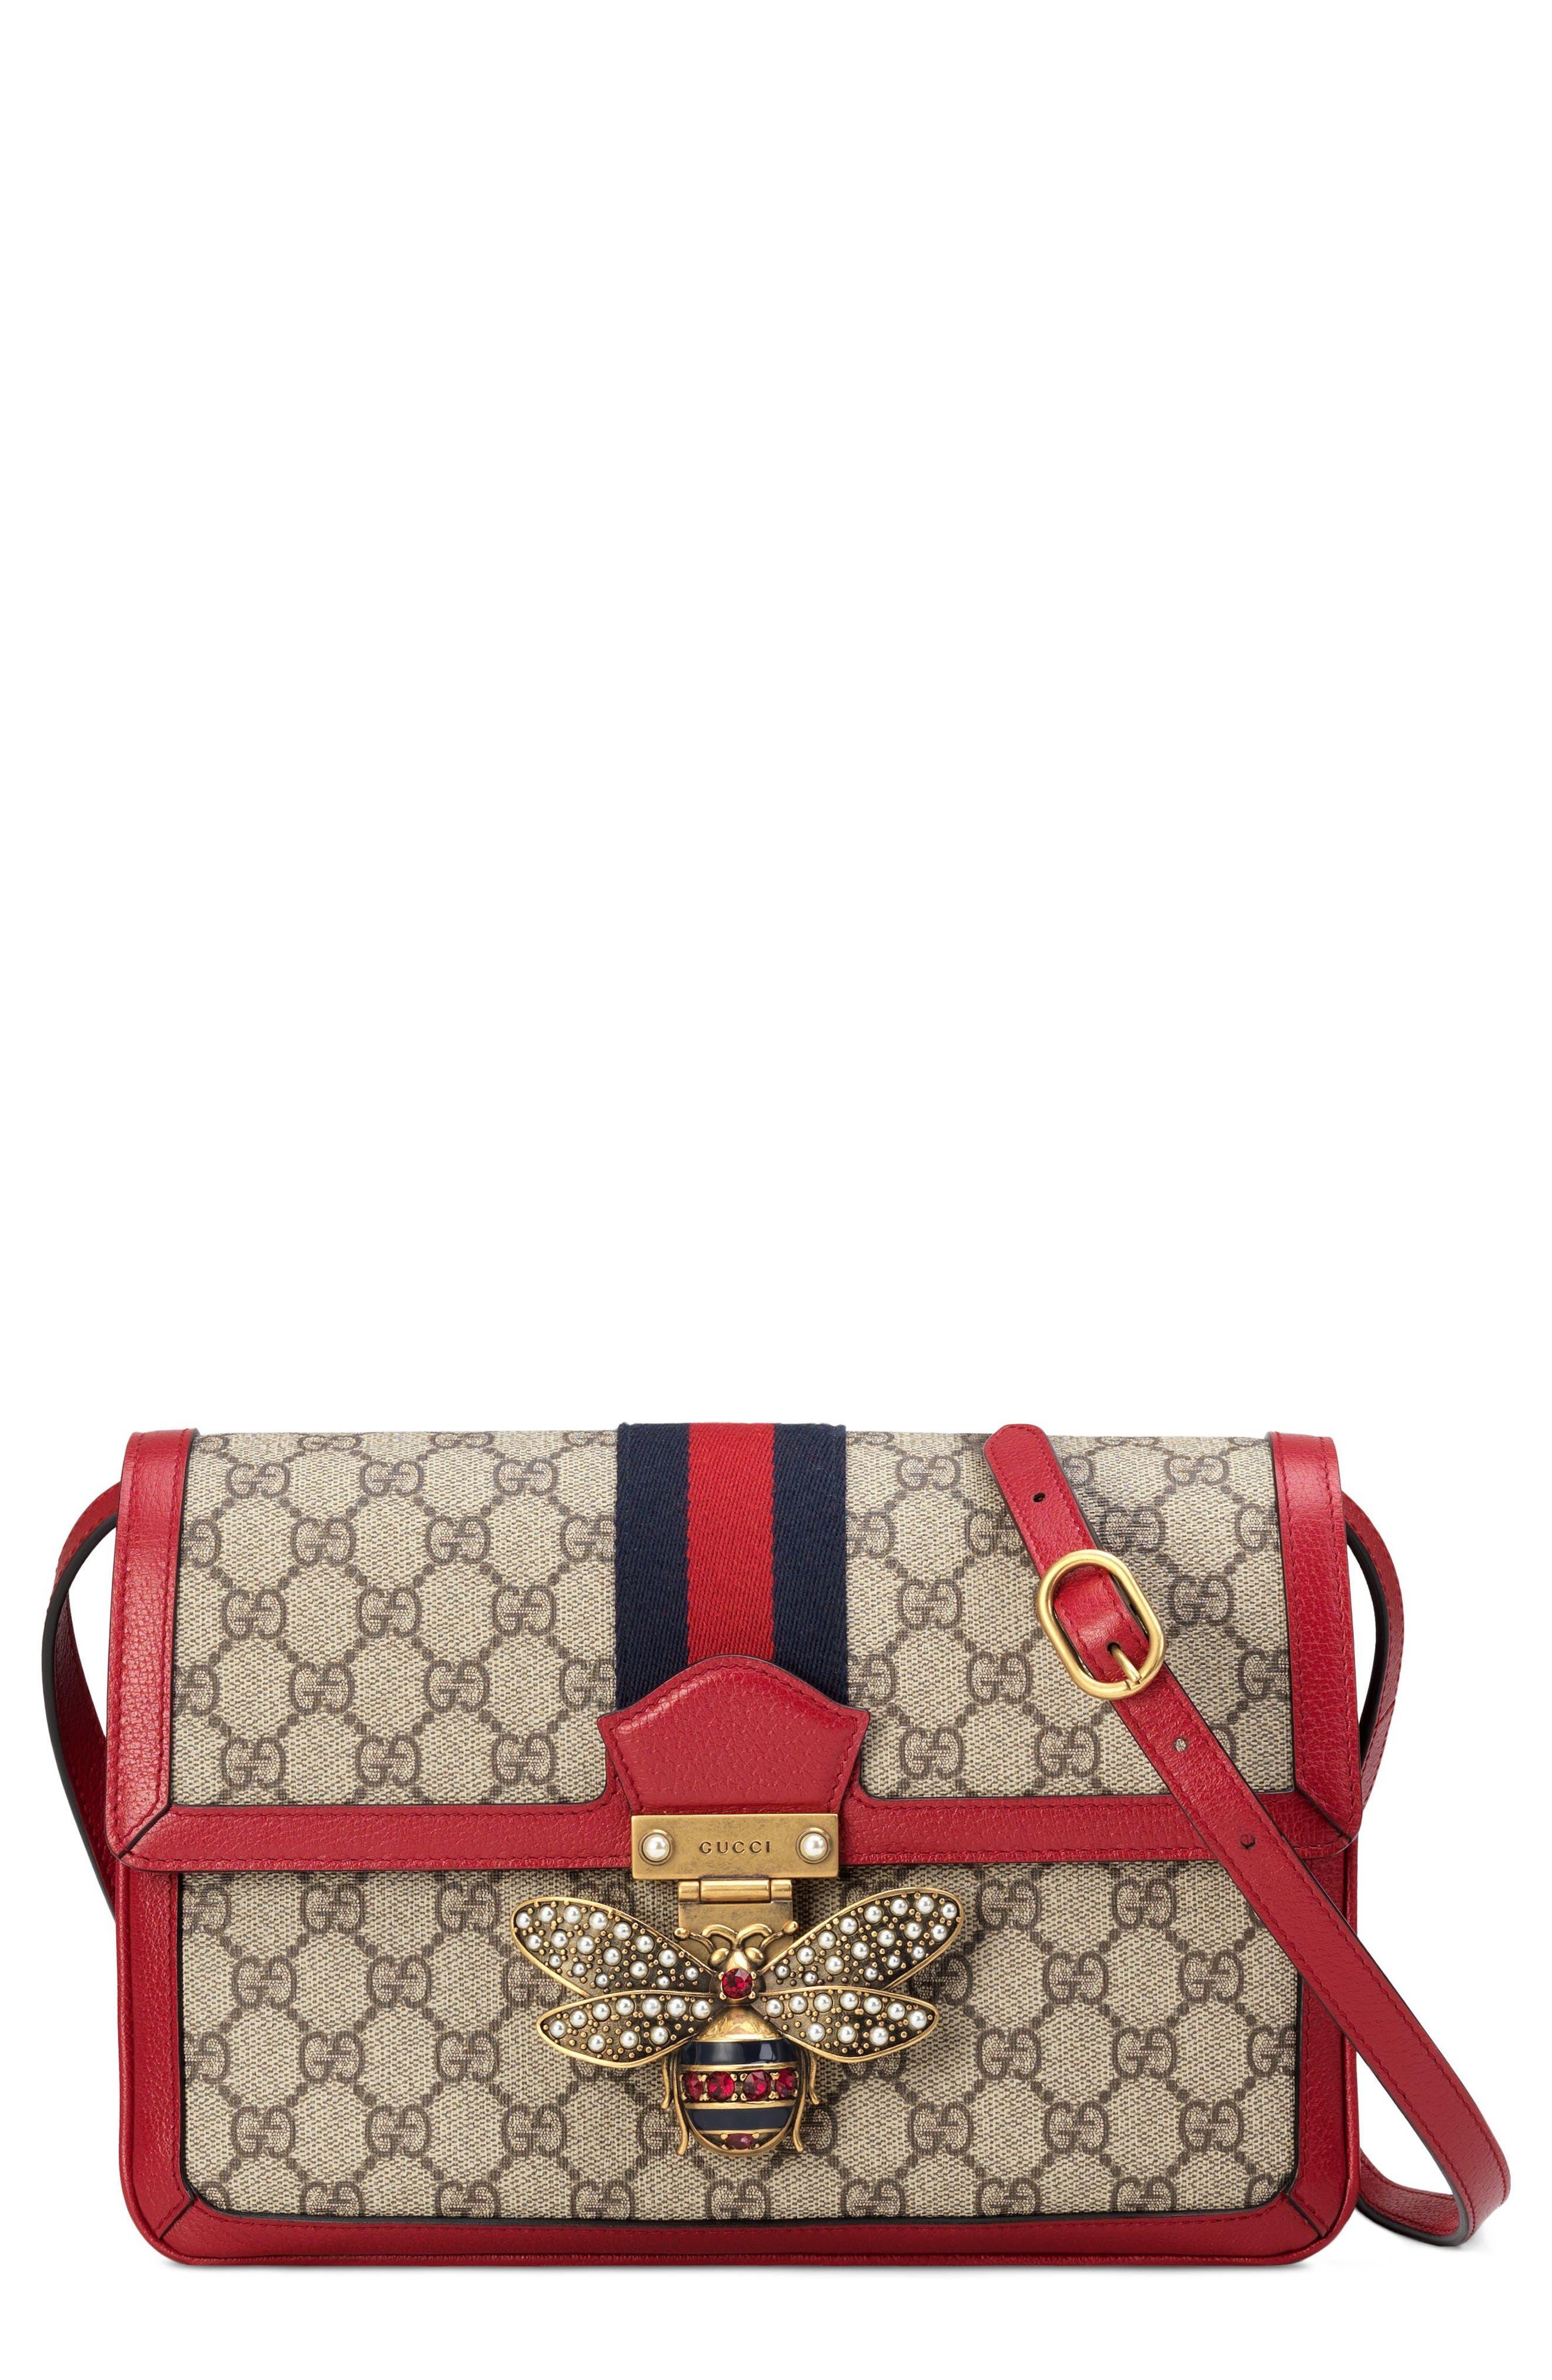 Queen Margaret GG Supreme Small Crossbody Bag,                             Main thumbnail 1, color,